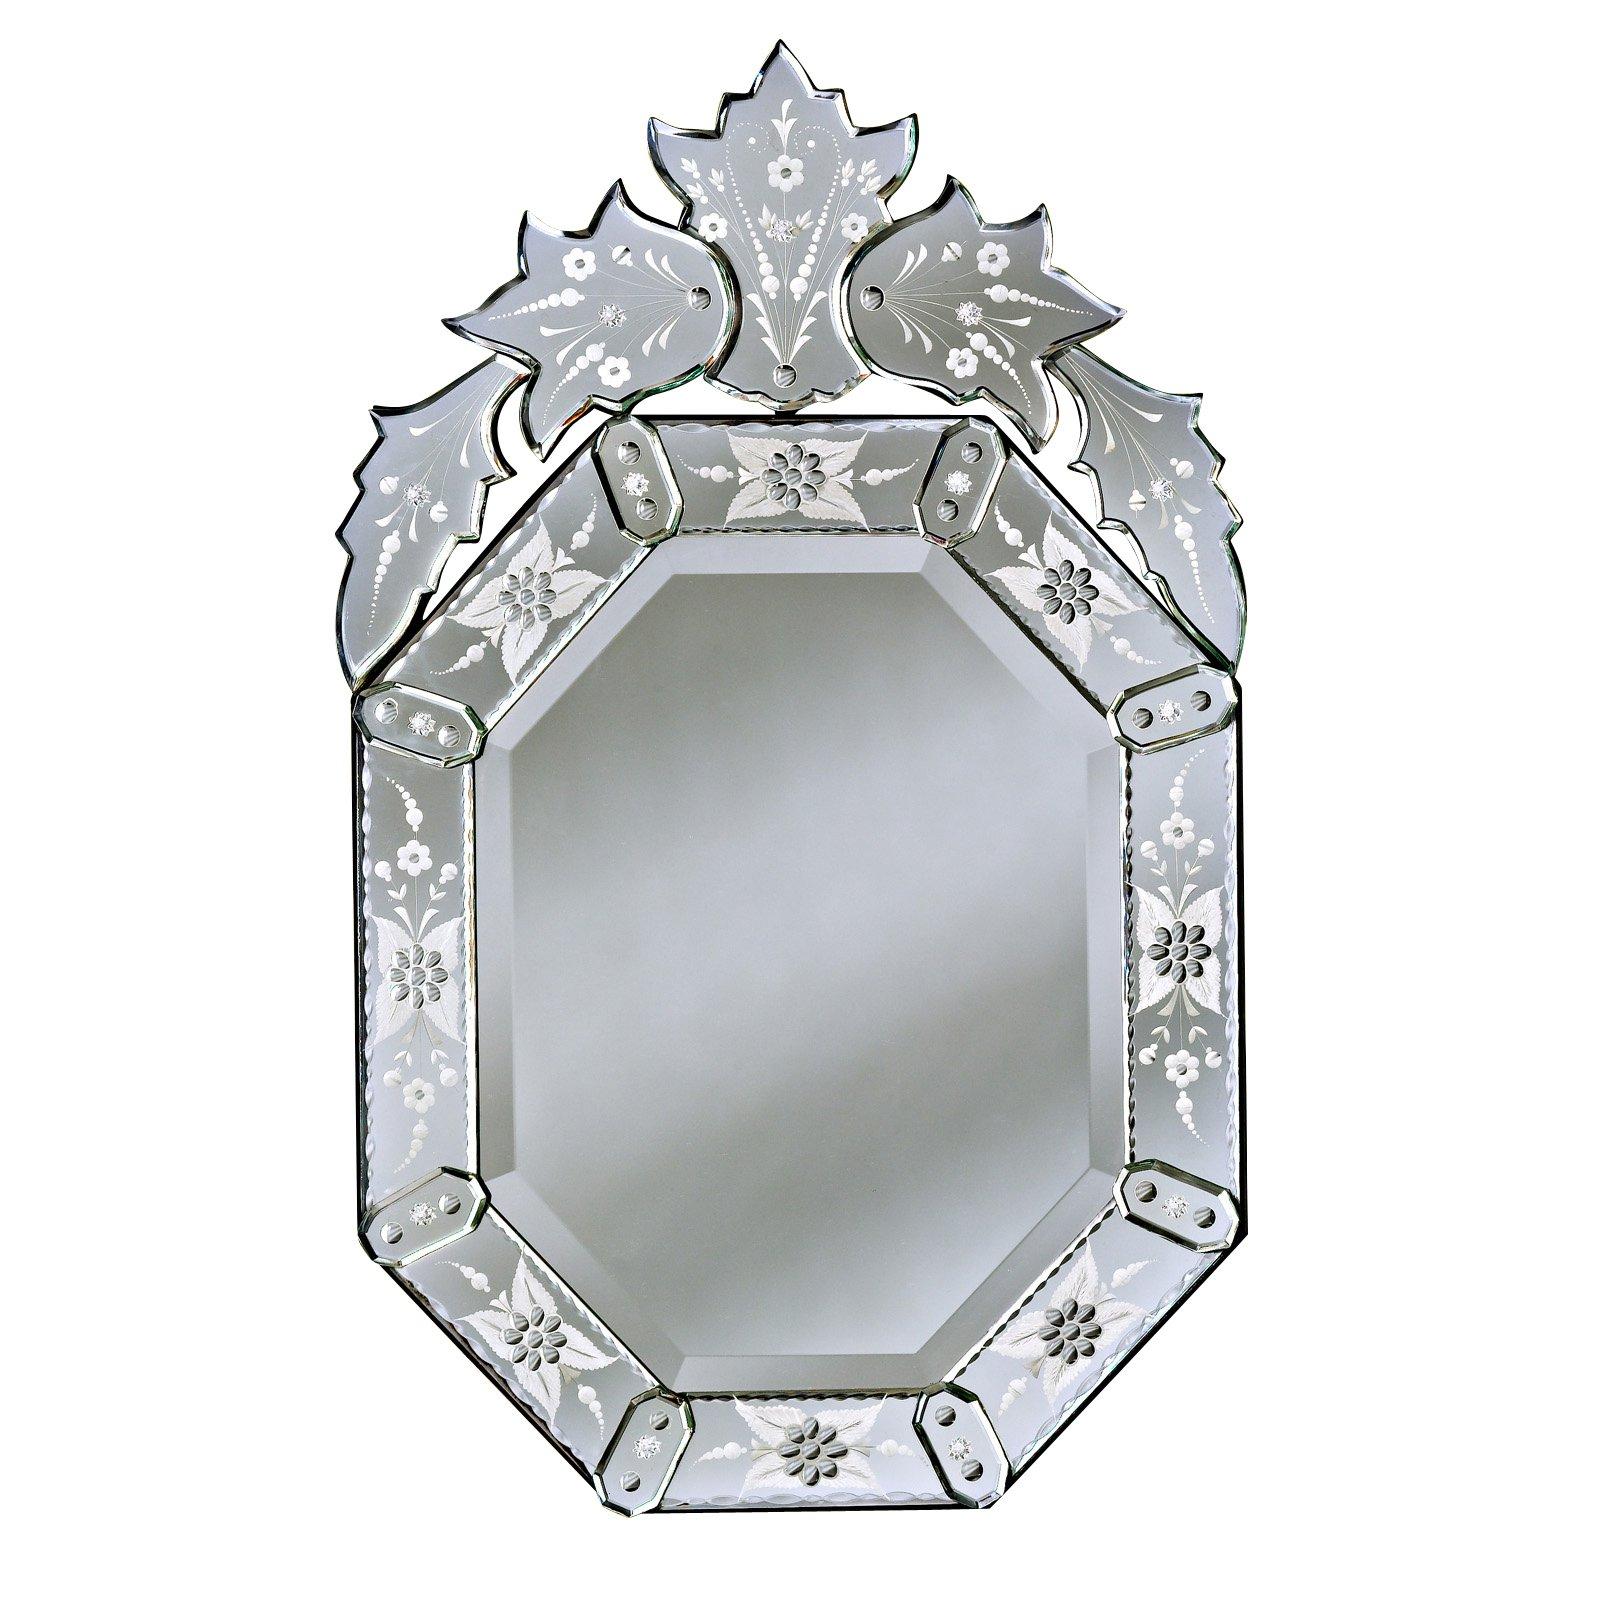 Olivia Venetian Medium Wall Mirror - 20W x 33H in.